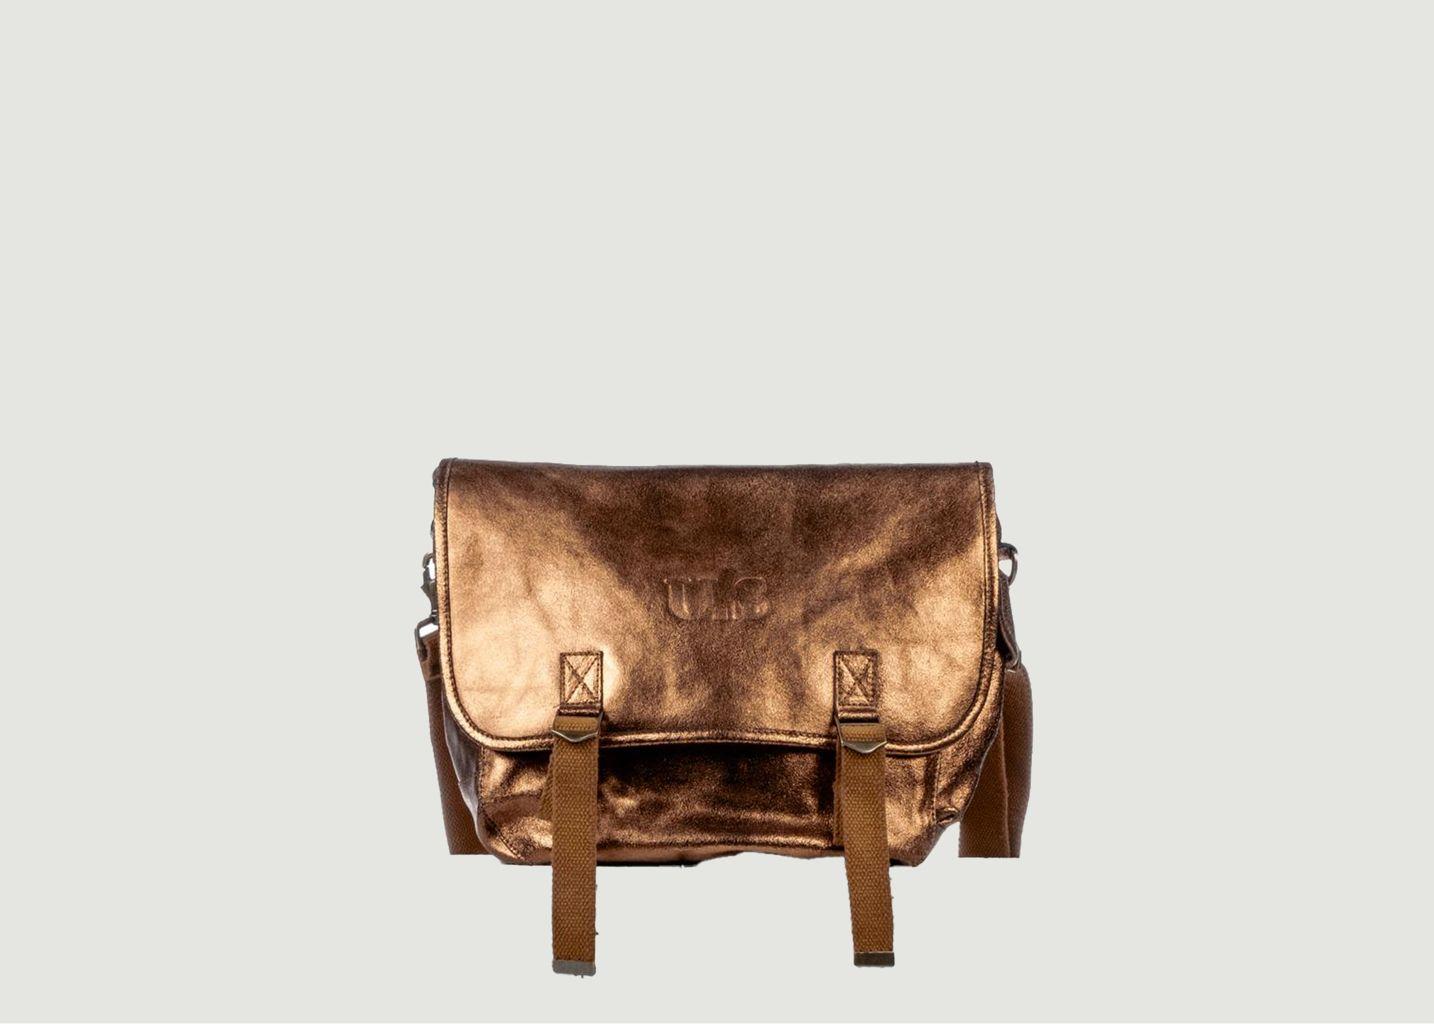 Grand sac cuir métallisé - SAC US